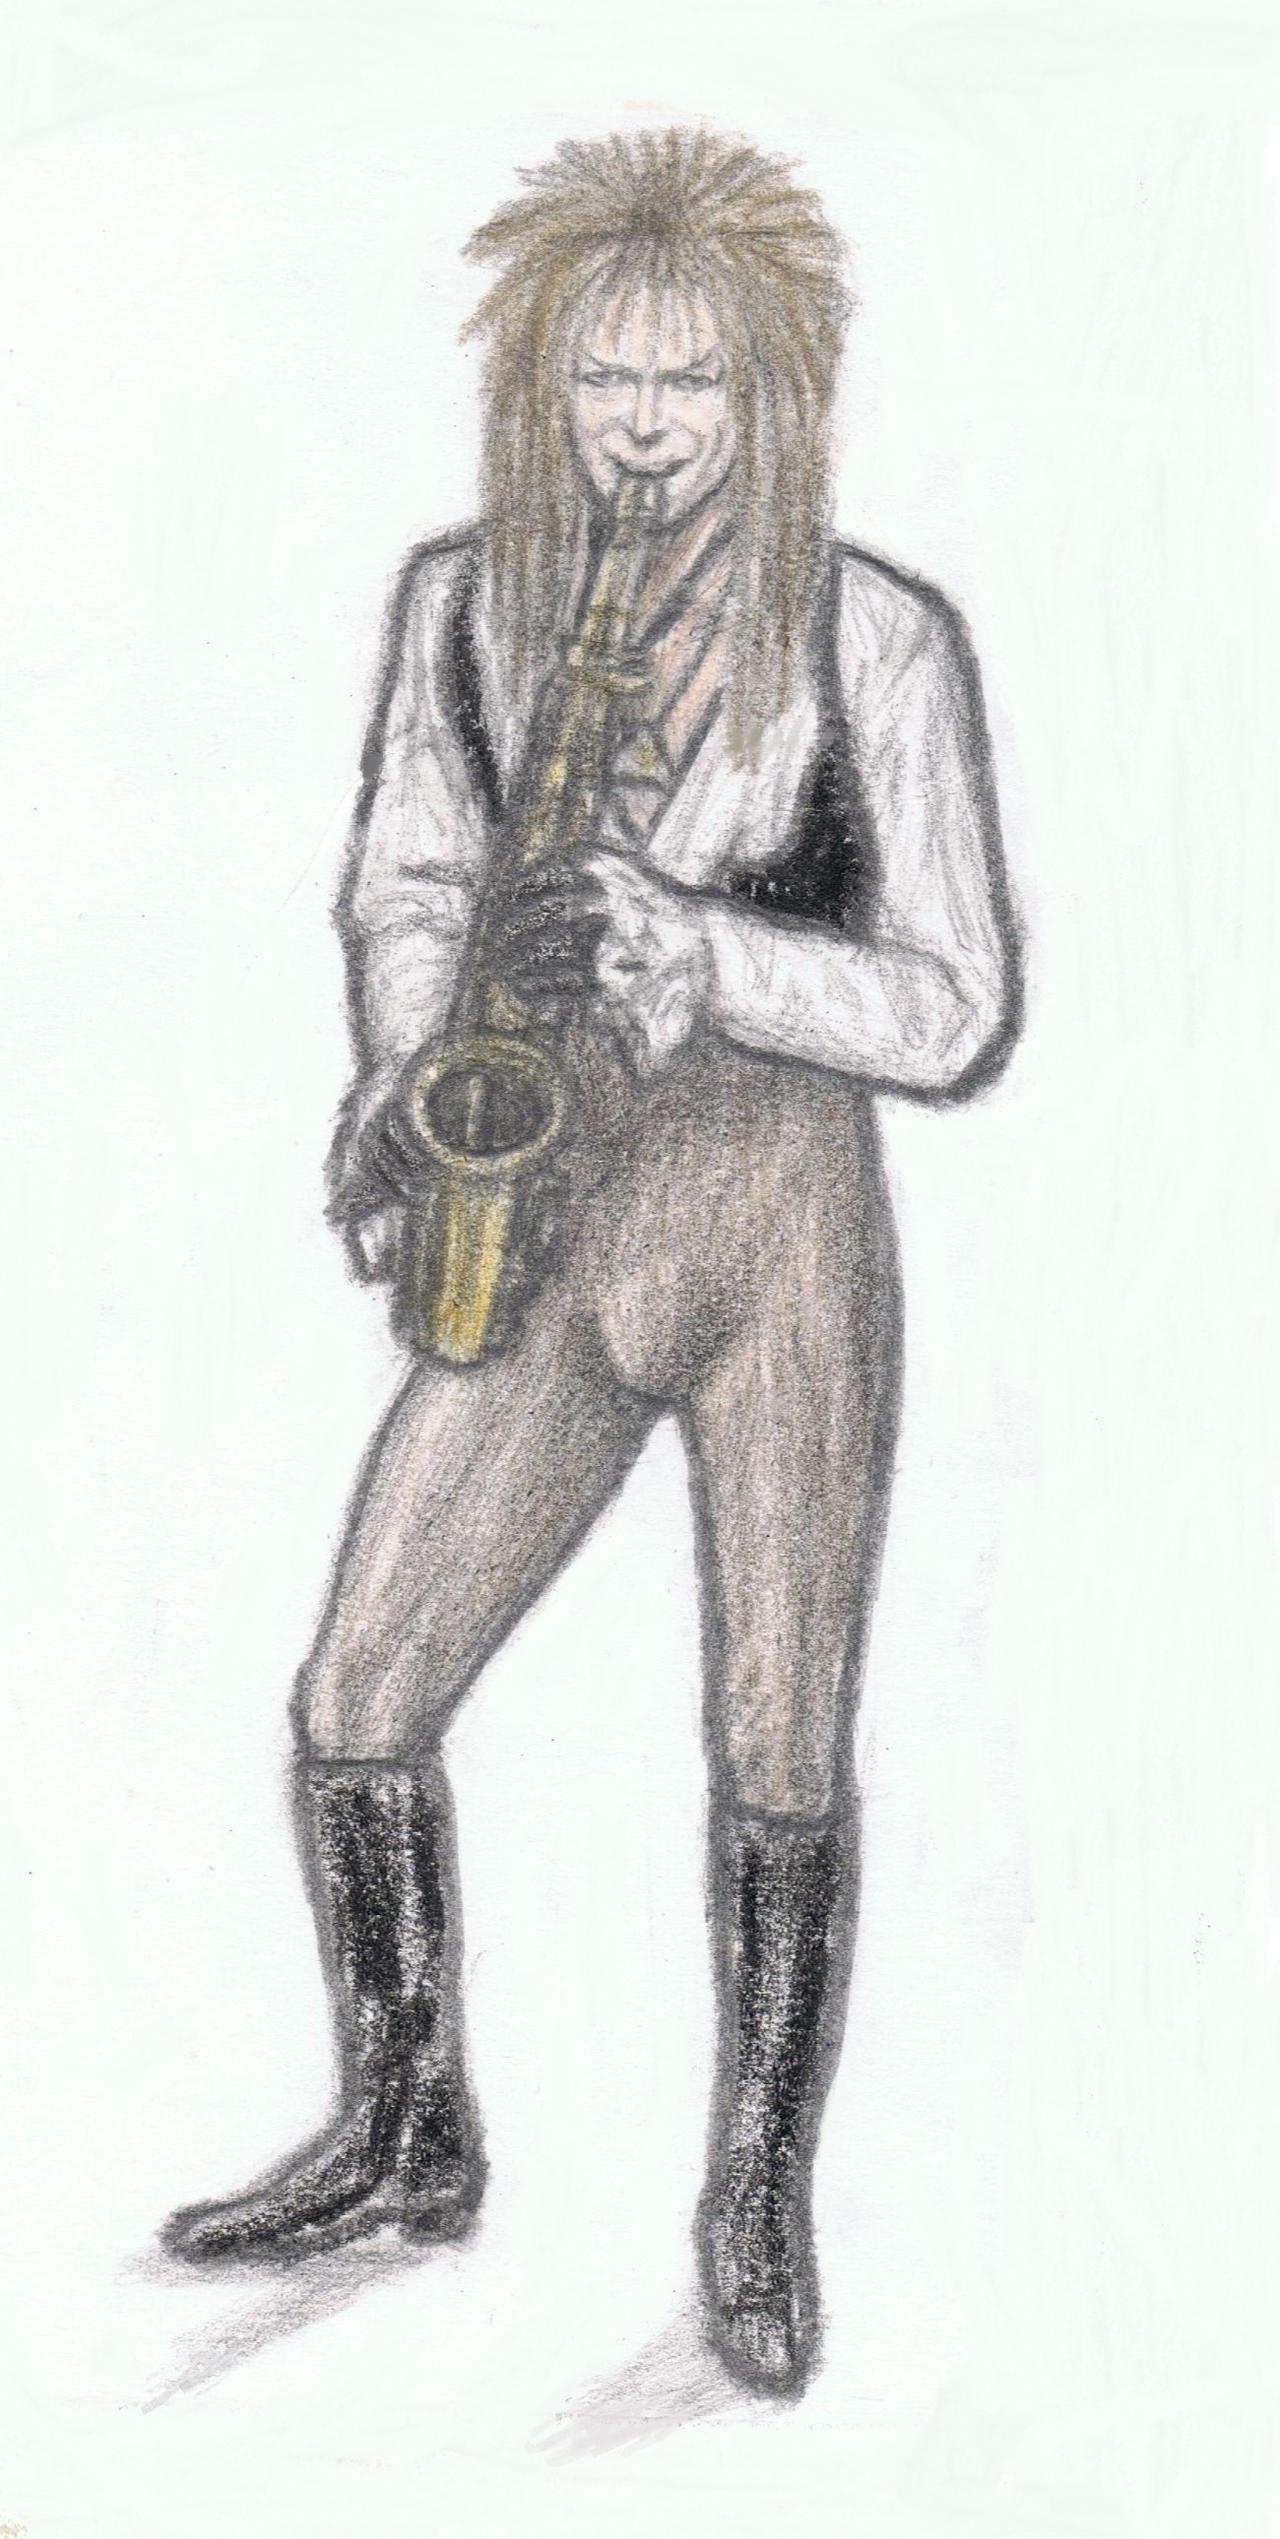 Goblin King playing saxophone by gagambo